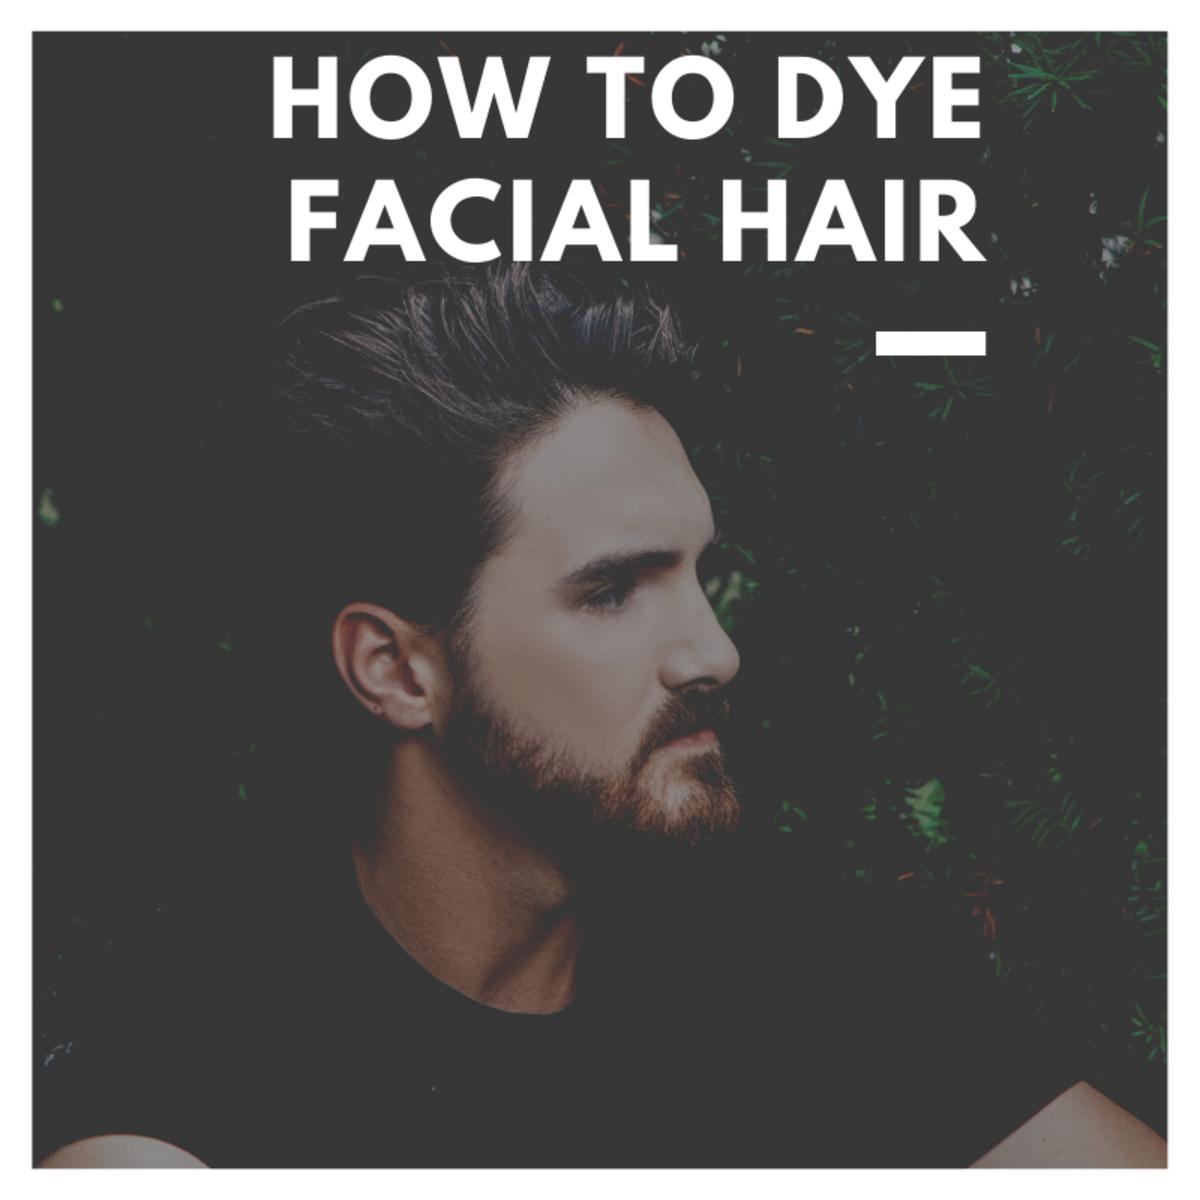 How to Dye Facial Hair